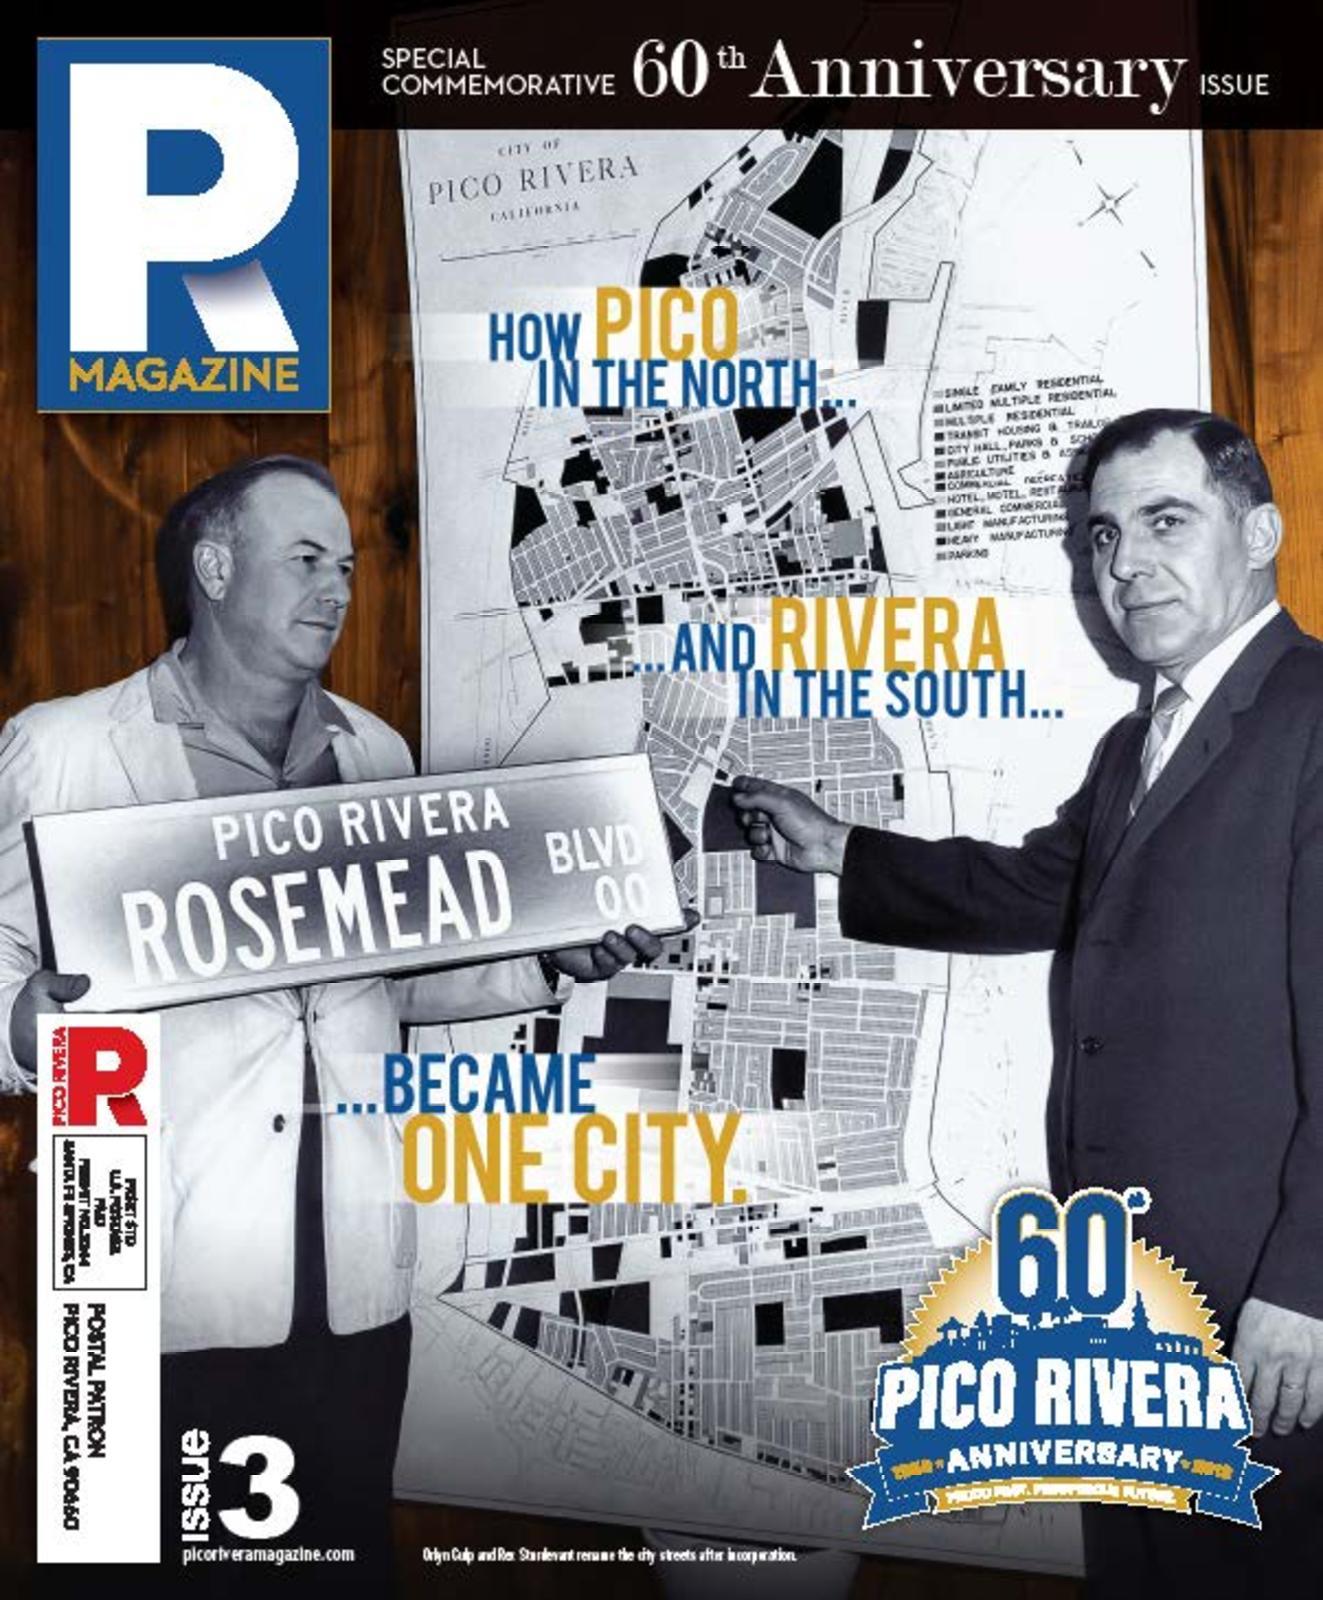 Midget rodeo pico rivera